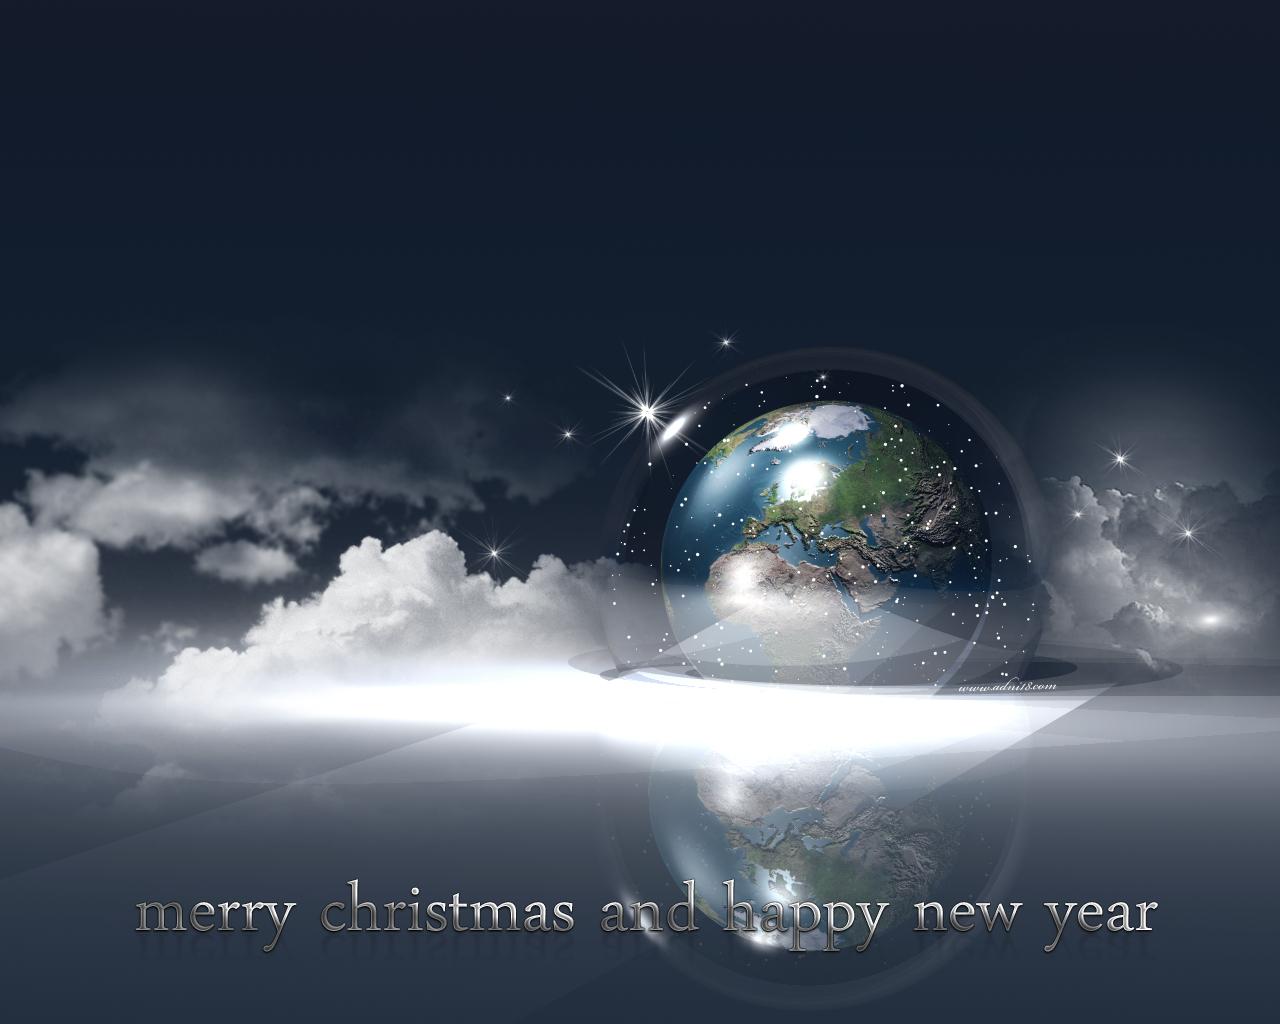 http://1.bp.blogspot.com/_brrsmWt5td0/TQo5O8gGn0I/AAAAAAAAAYY/eswTsrbBHp4/s1600/White-Christmas_wallpaper.jpg